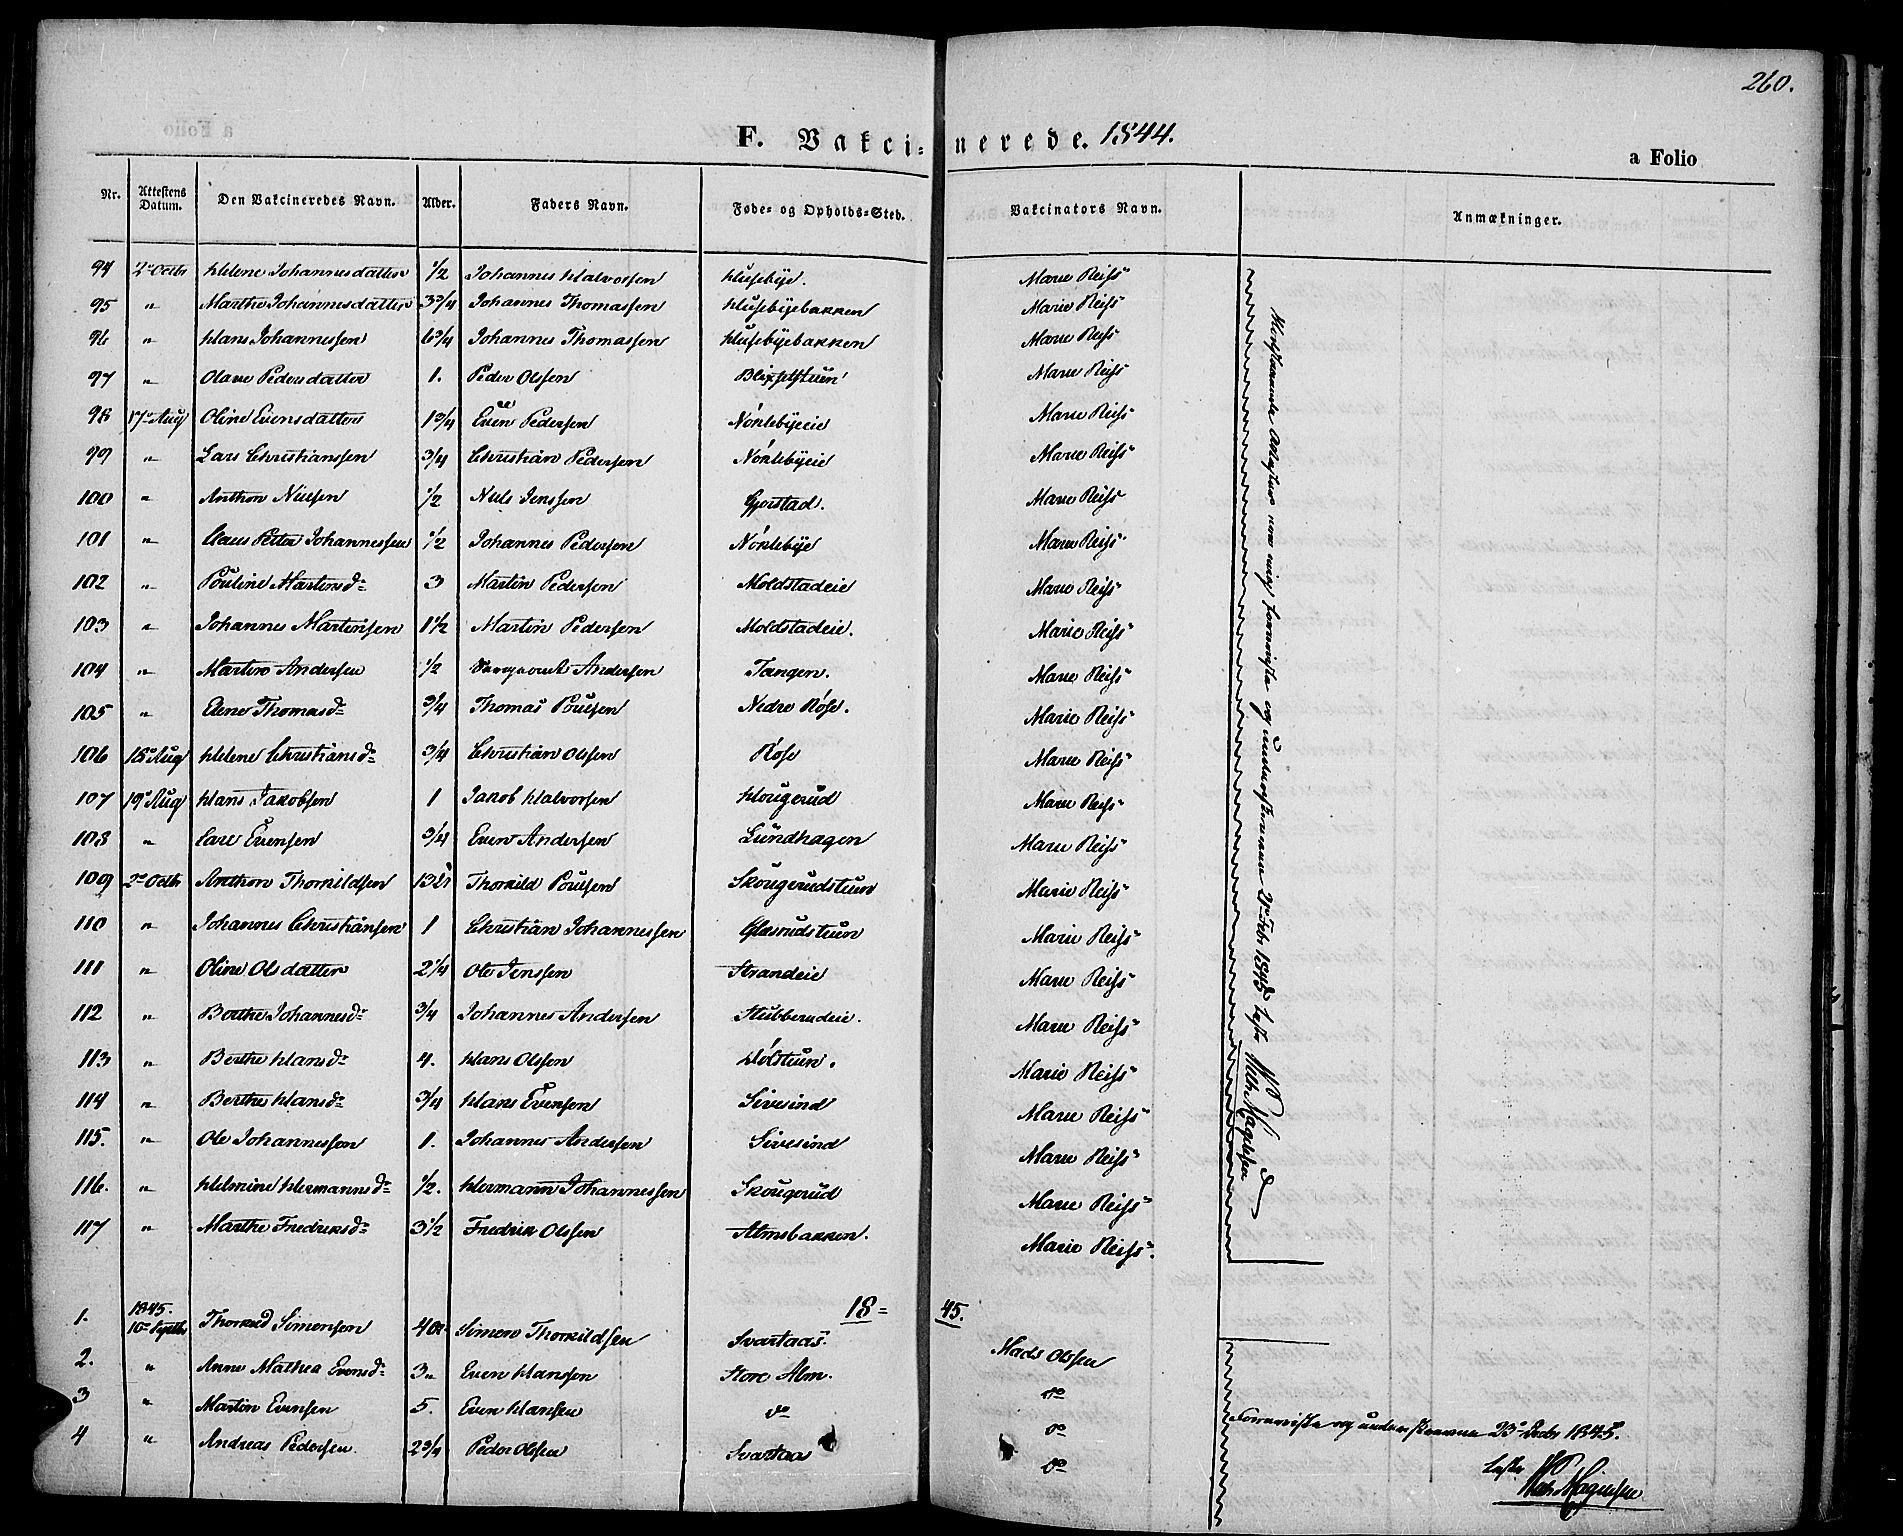 SAH, Vestre Toten prestekontor, H/Ha/Haa/L0004: Ministerialbok nr. 4, 1844-1849, s. 260